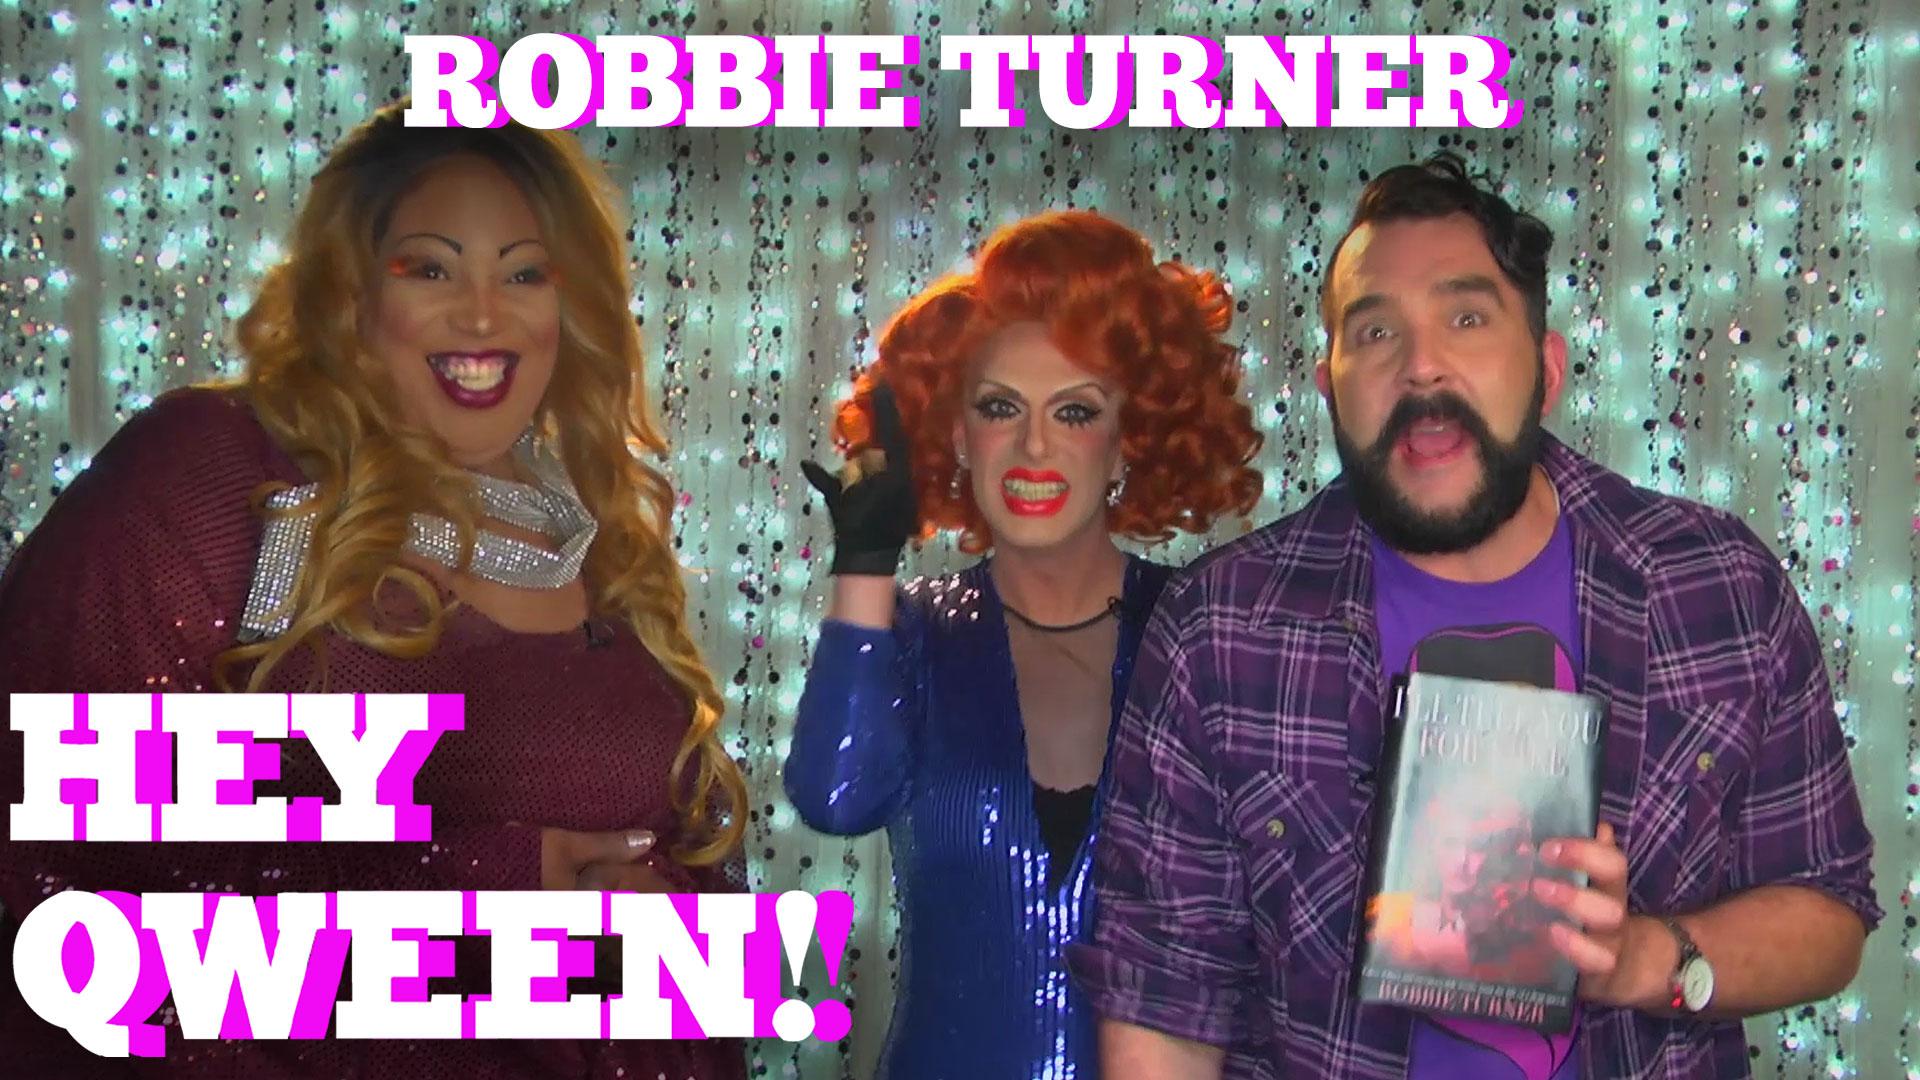 ROBBIE TURNER on HEY QWEEN! with Jonny McGovern PROMO!